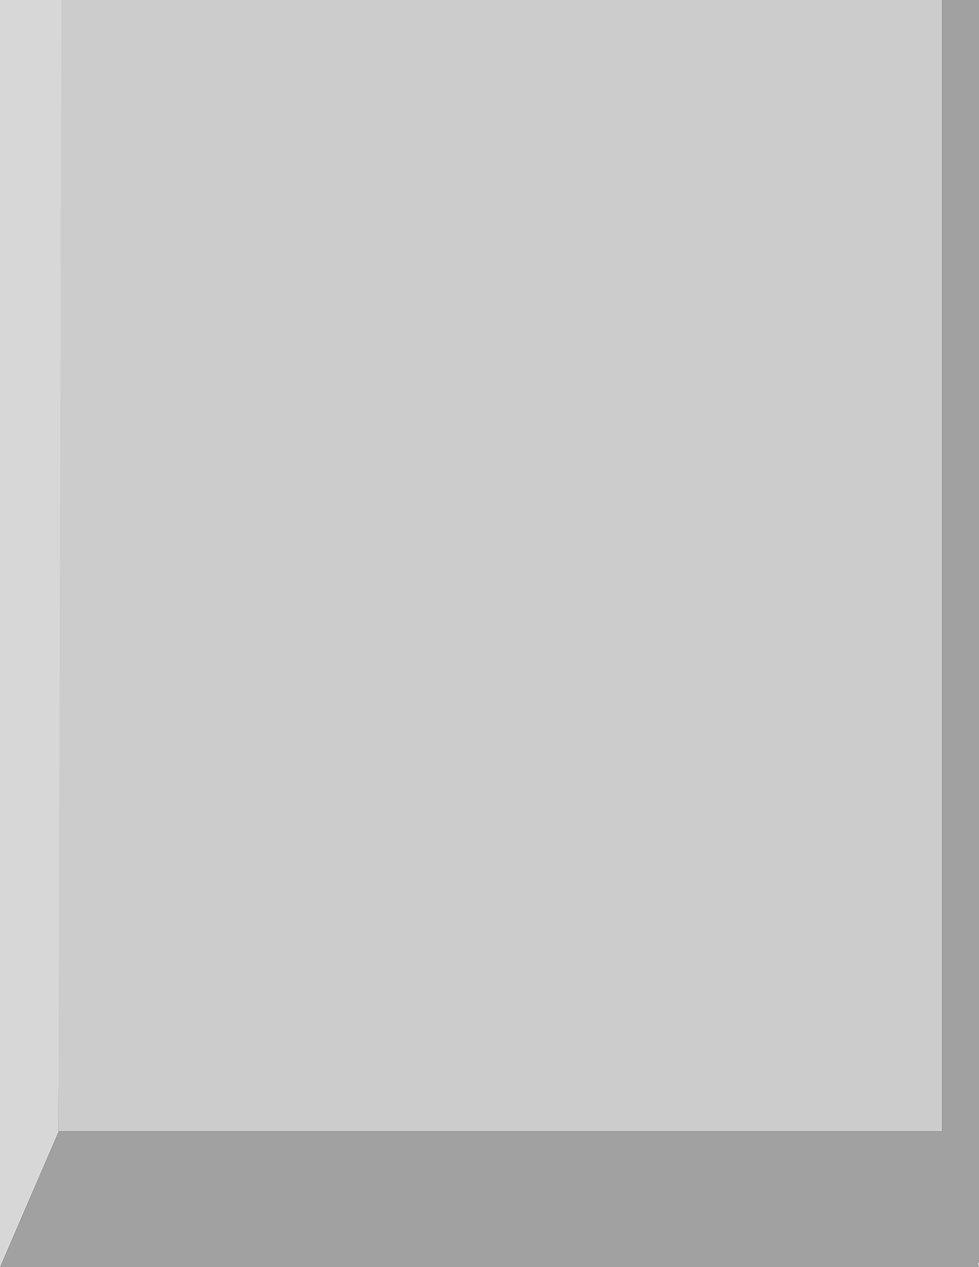 Wix Backdrop 3.jpg